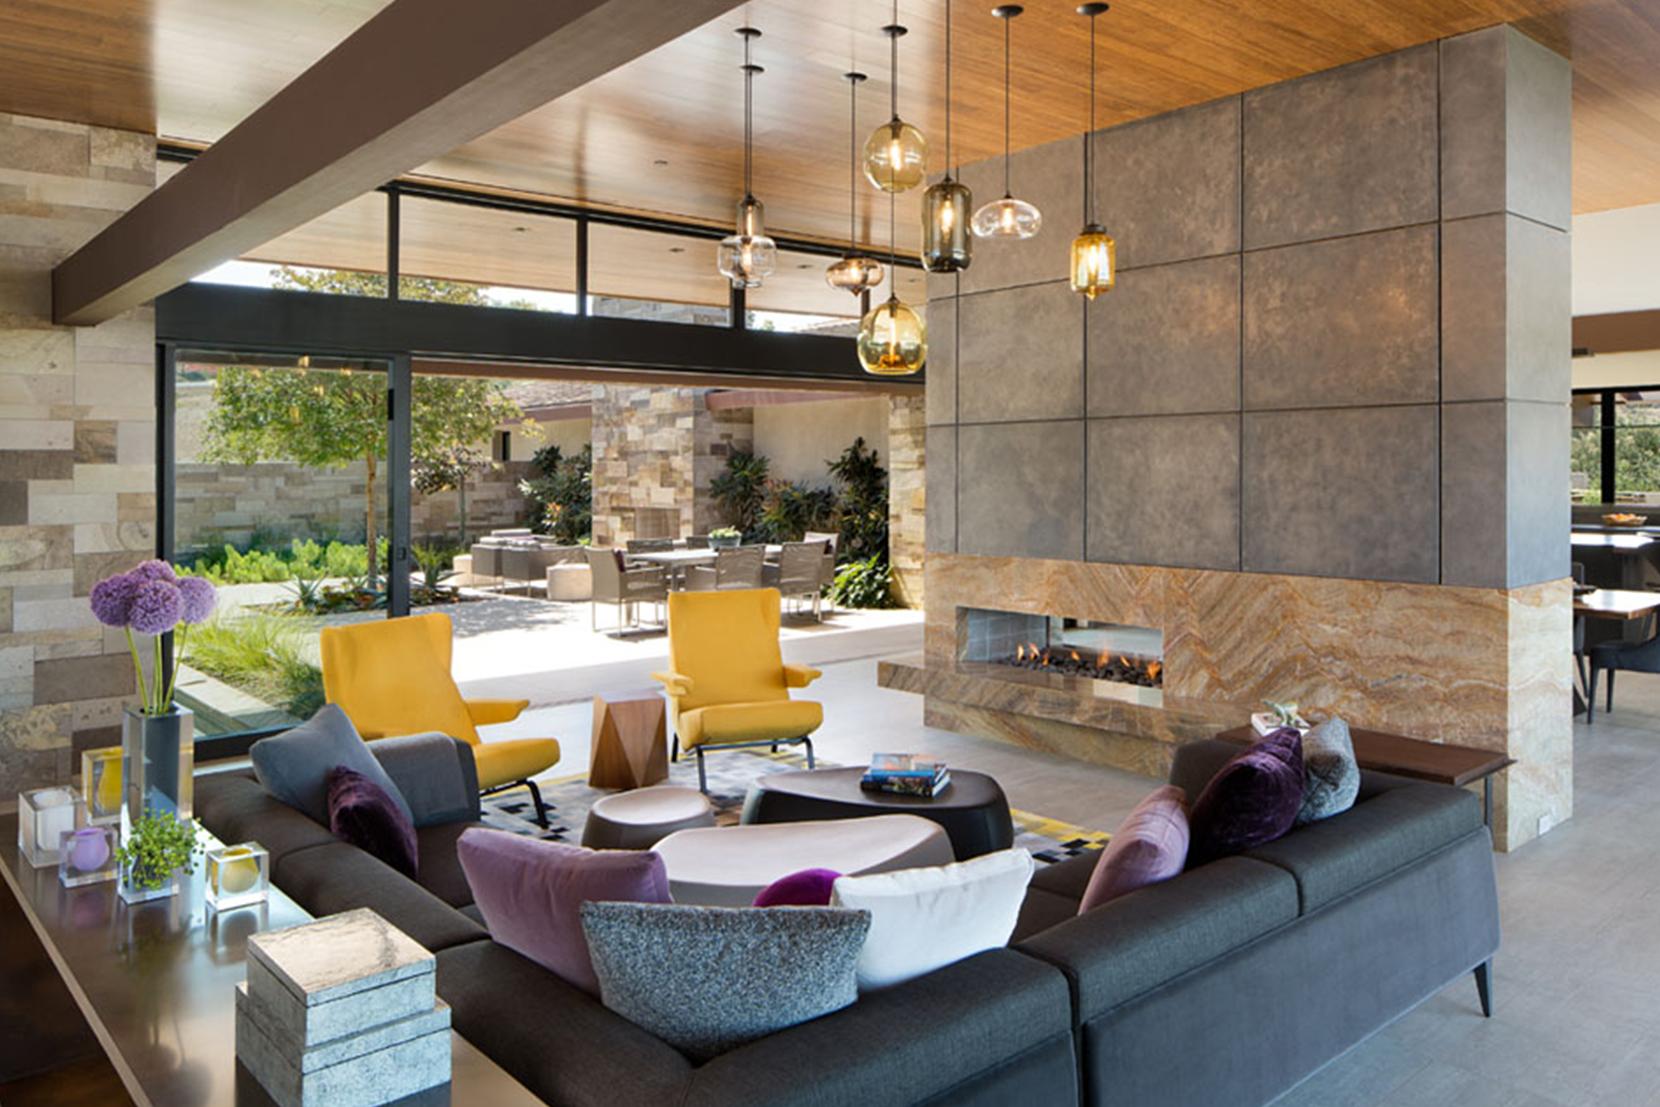 Modern Glass Living Room Lighting - Mixed Glass Pendant Lights